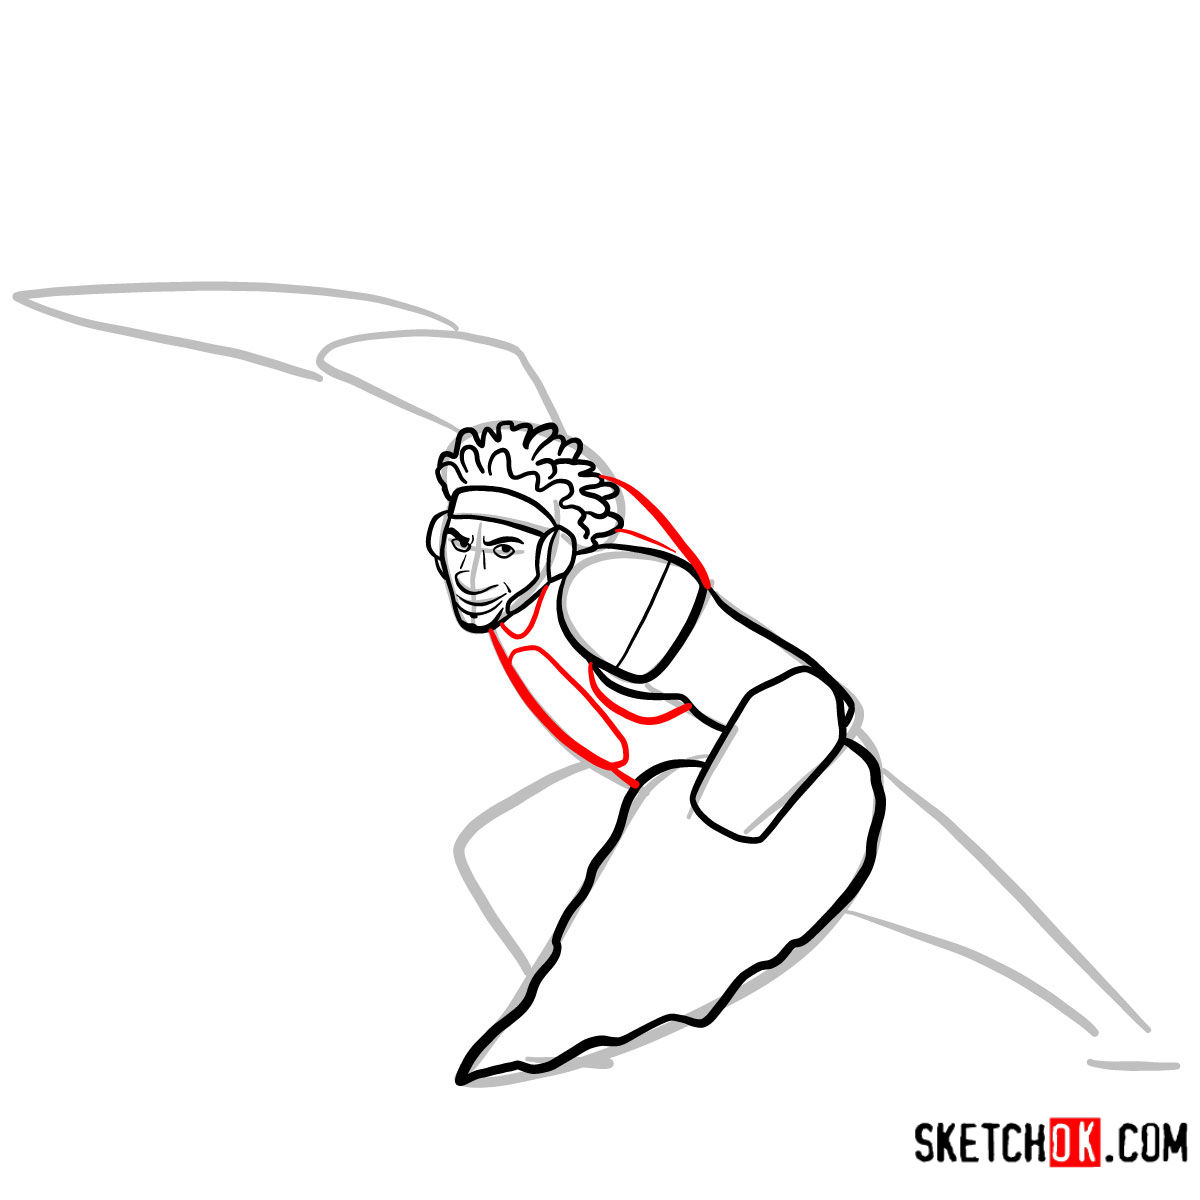 How to draw Wasabi as a superhero | Big Hero 6 - step 07